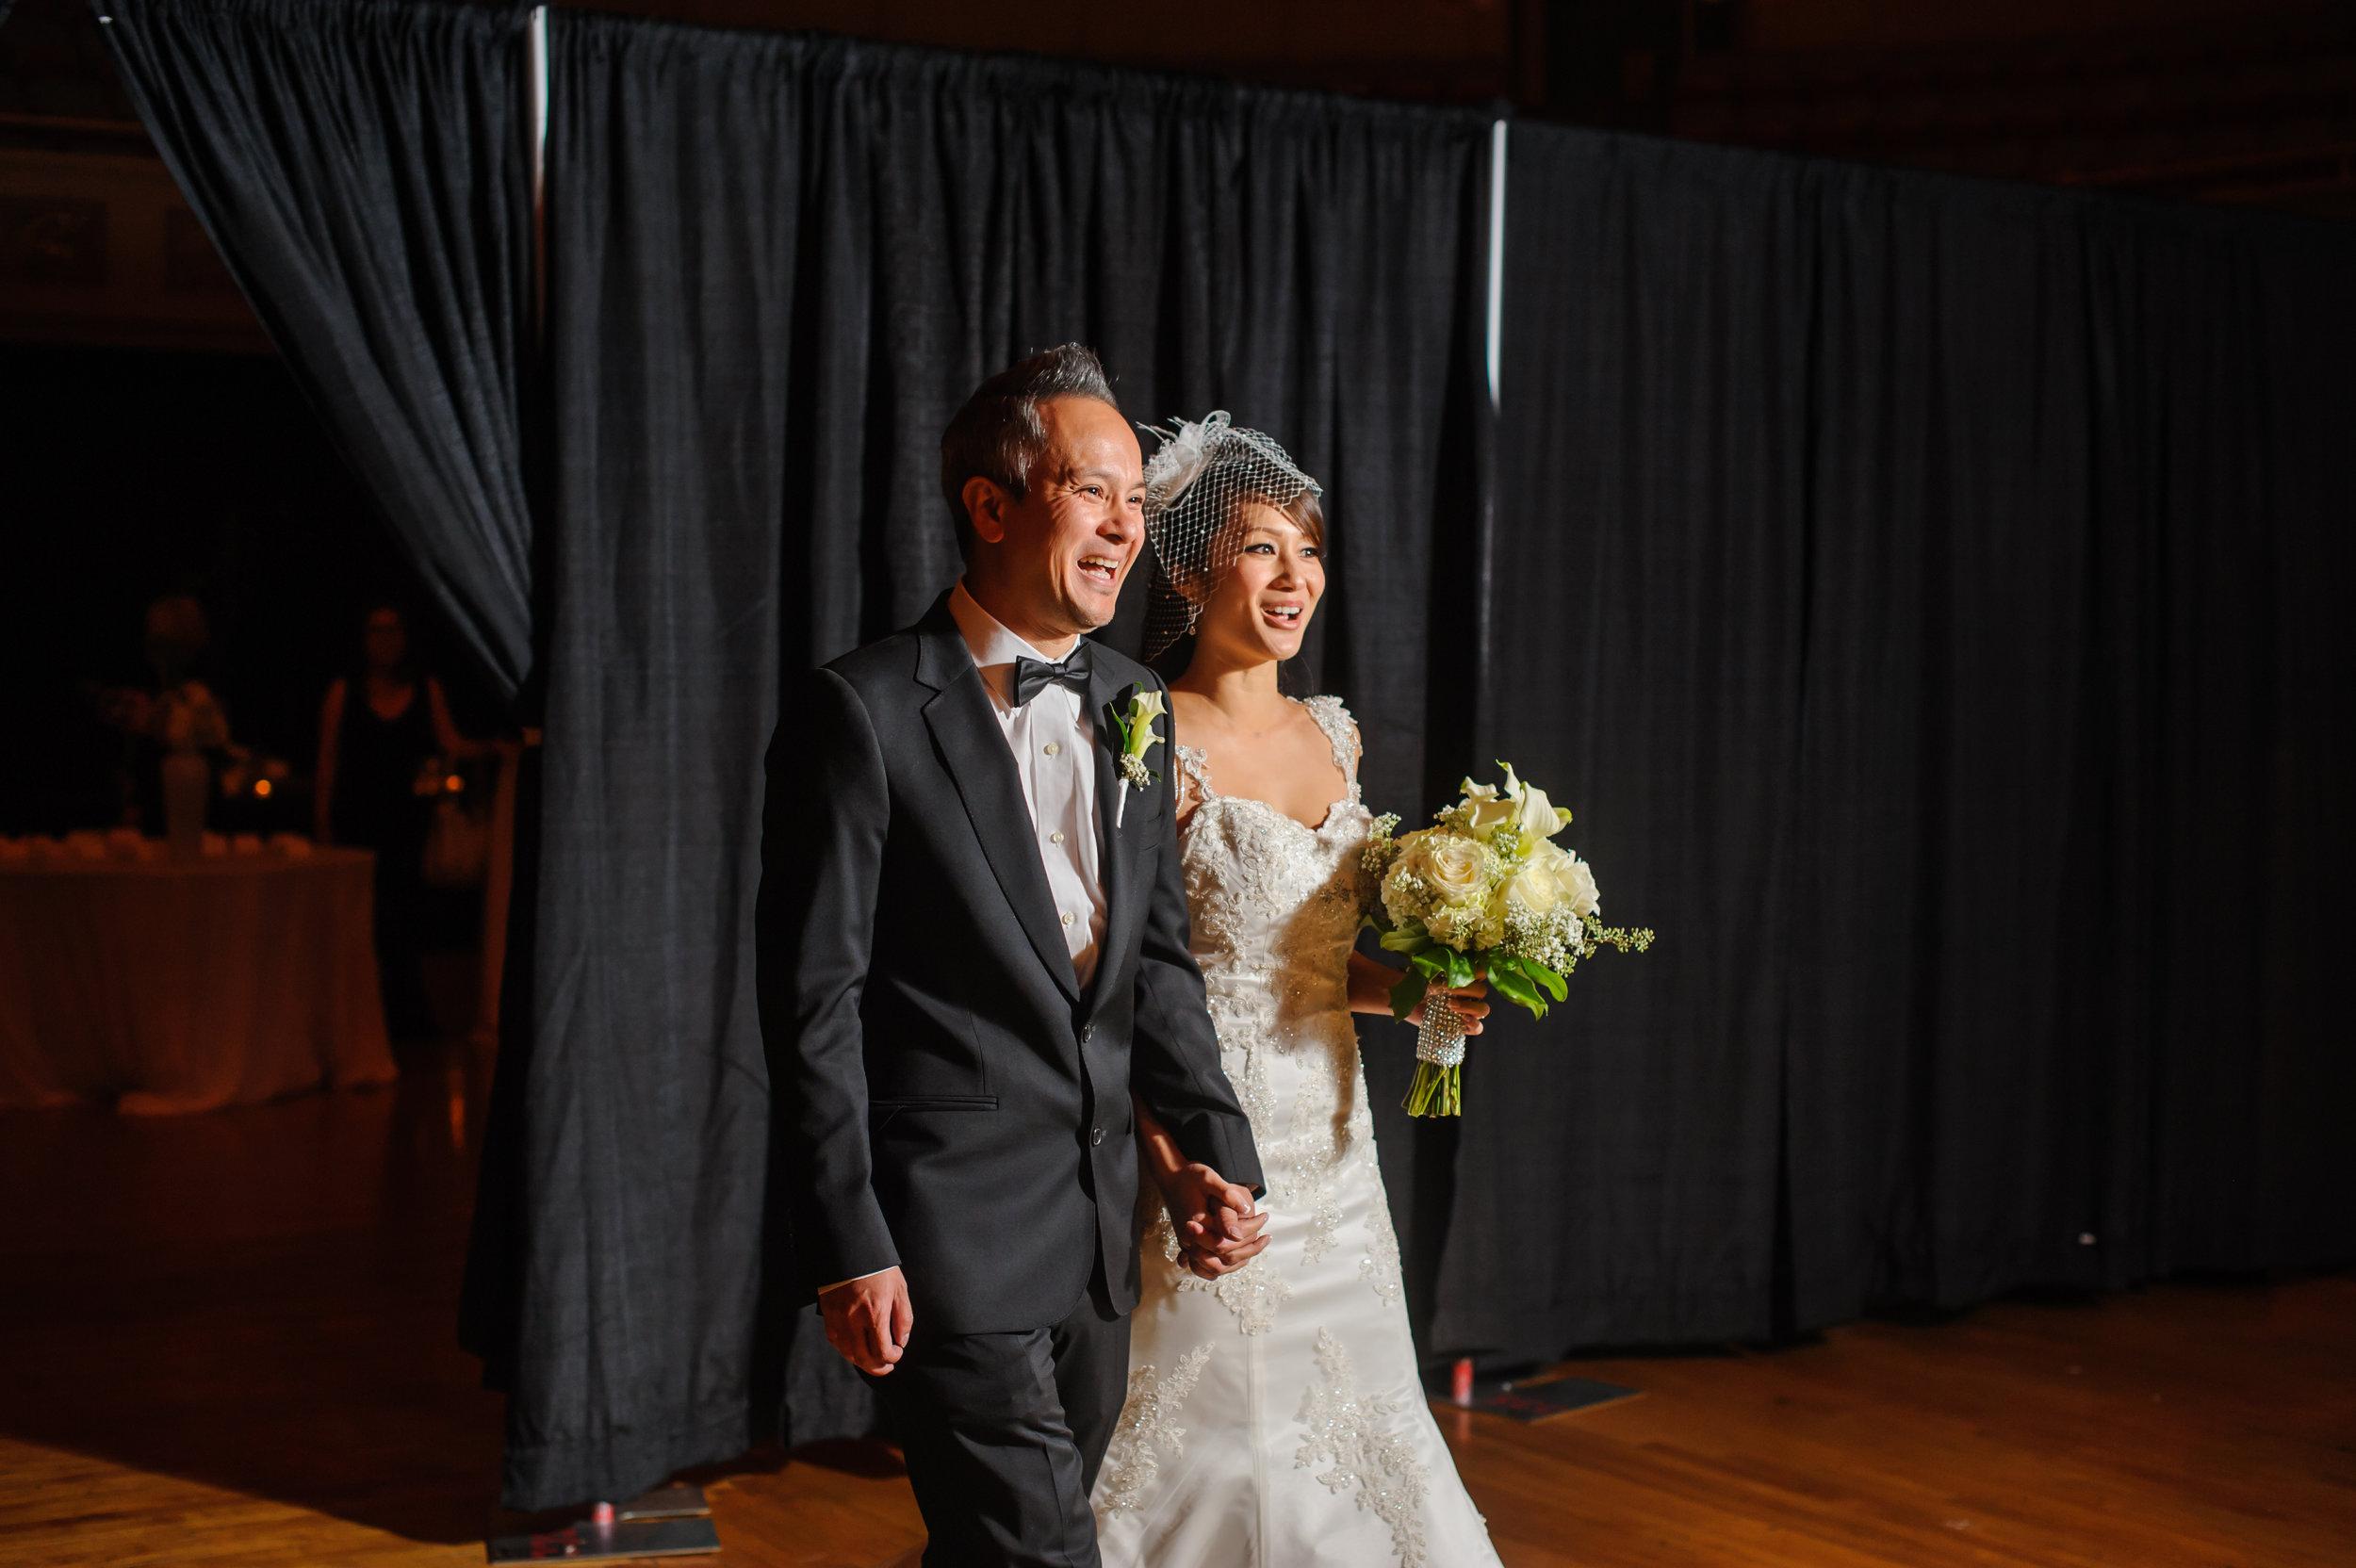 camilla-thuy-101-memorial-auditorium-sacramento-wedding-photographer-katherine-nicole-photography.JPG